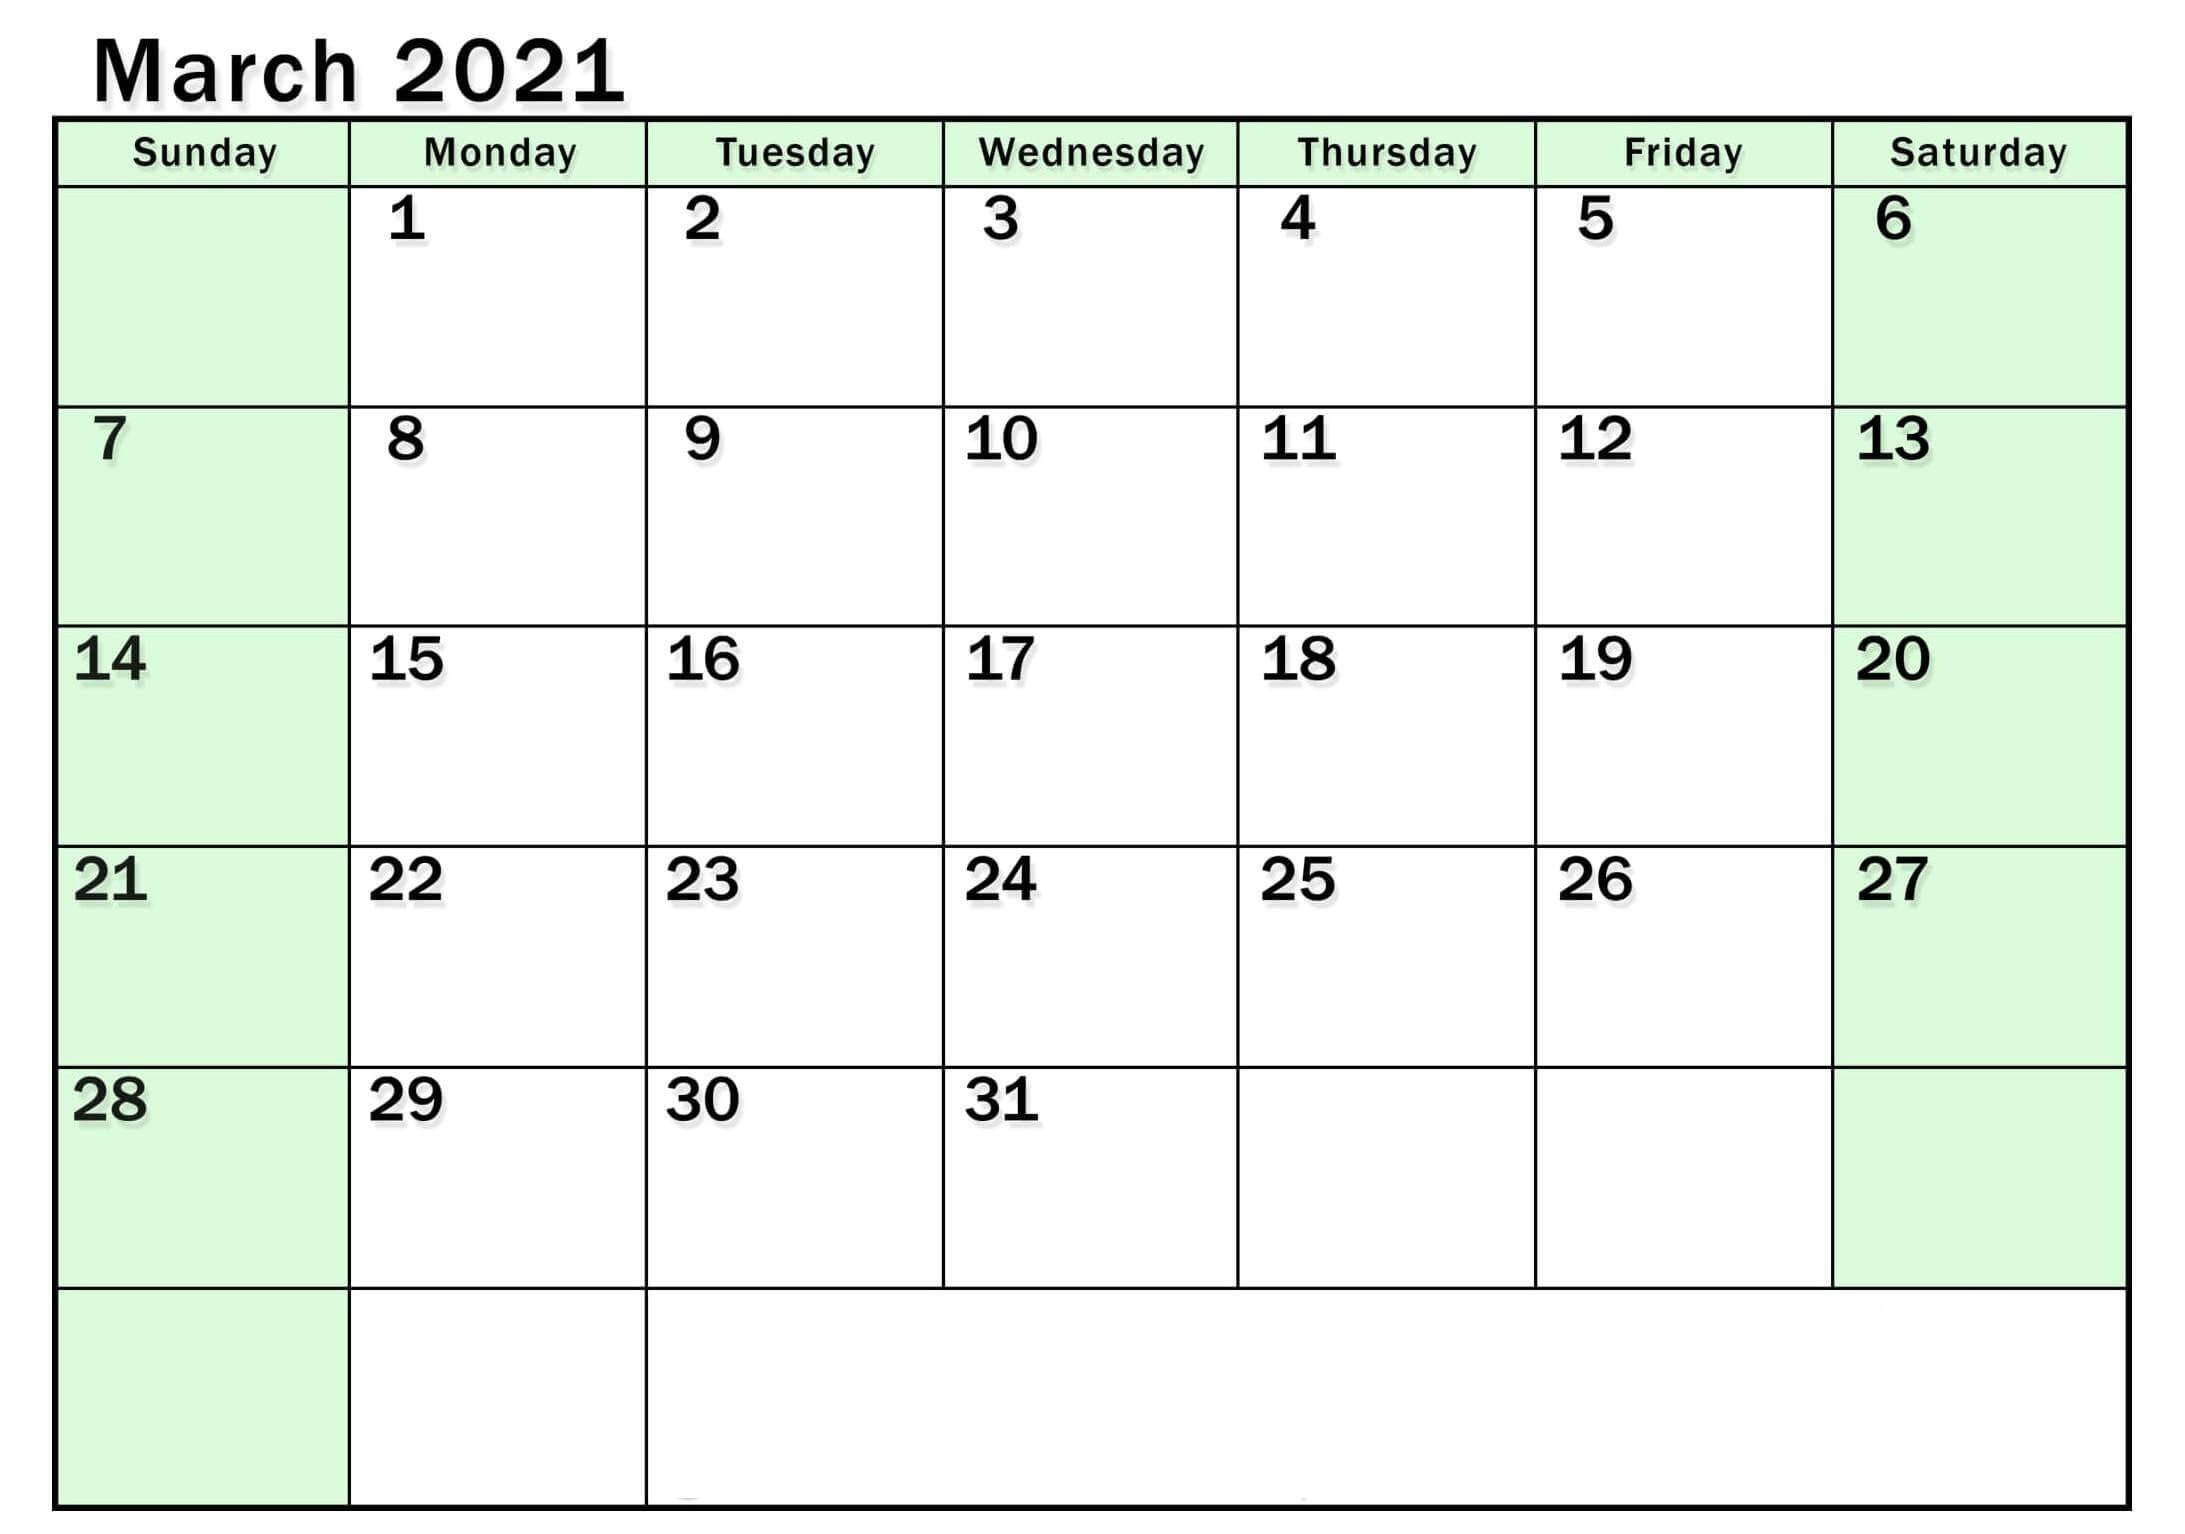 Print March 2021 Calendar Uk Bank & Public Holidays - Web